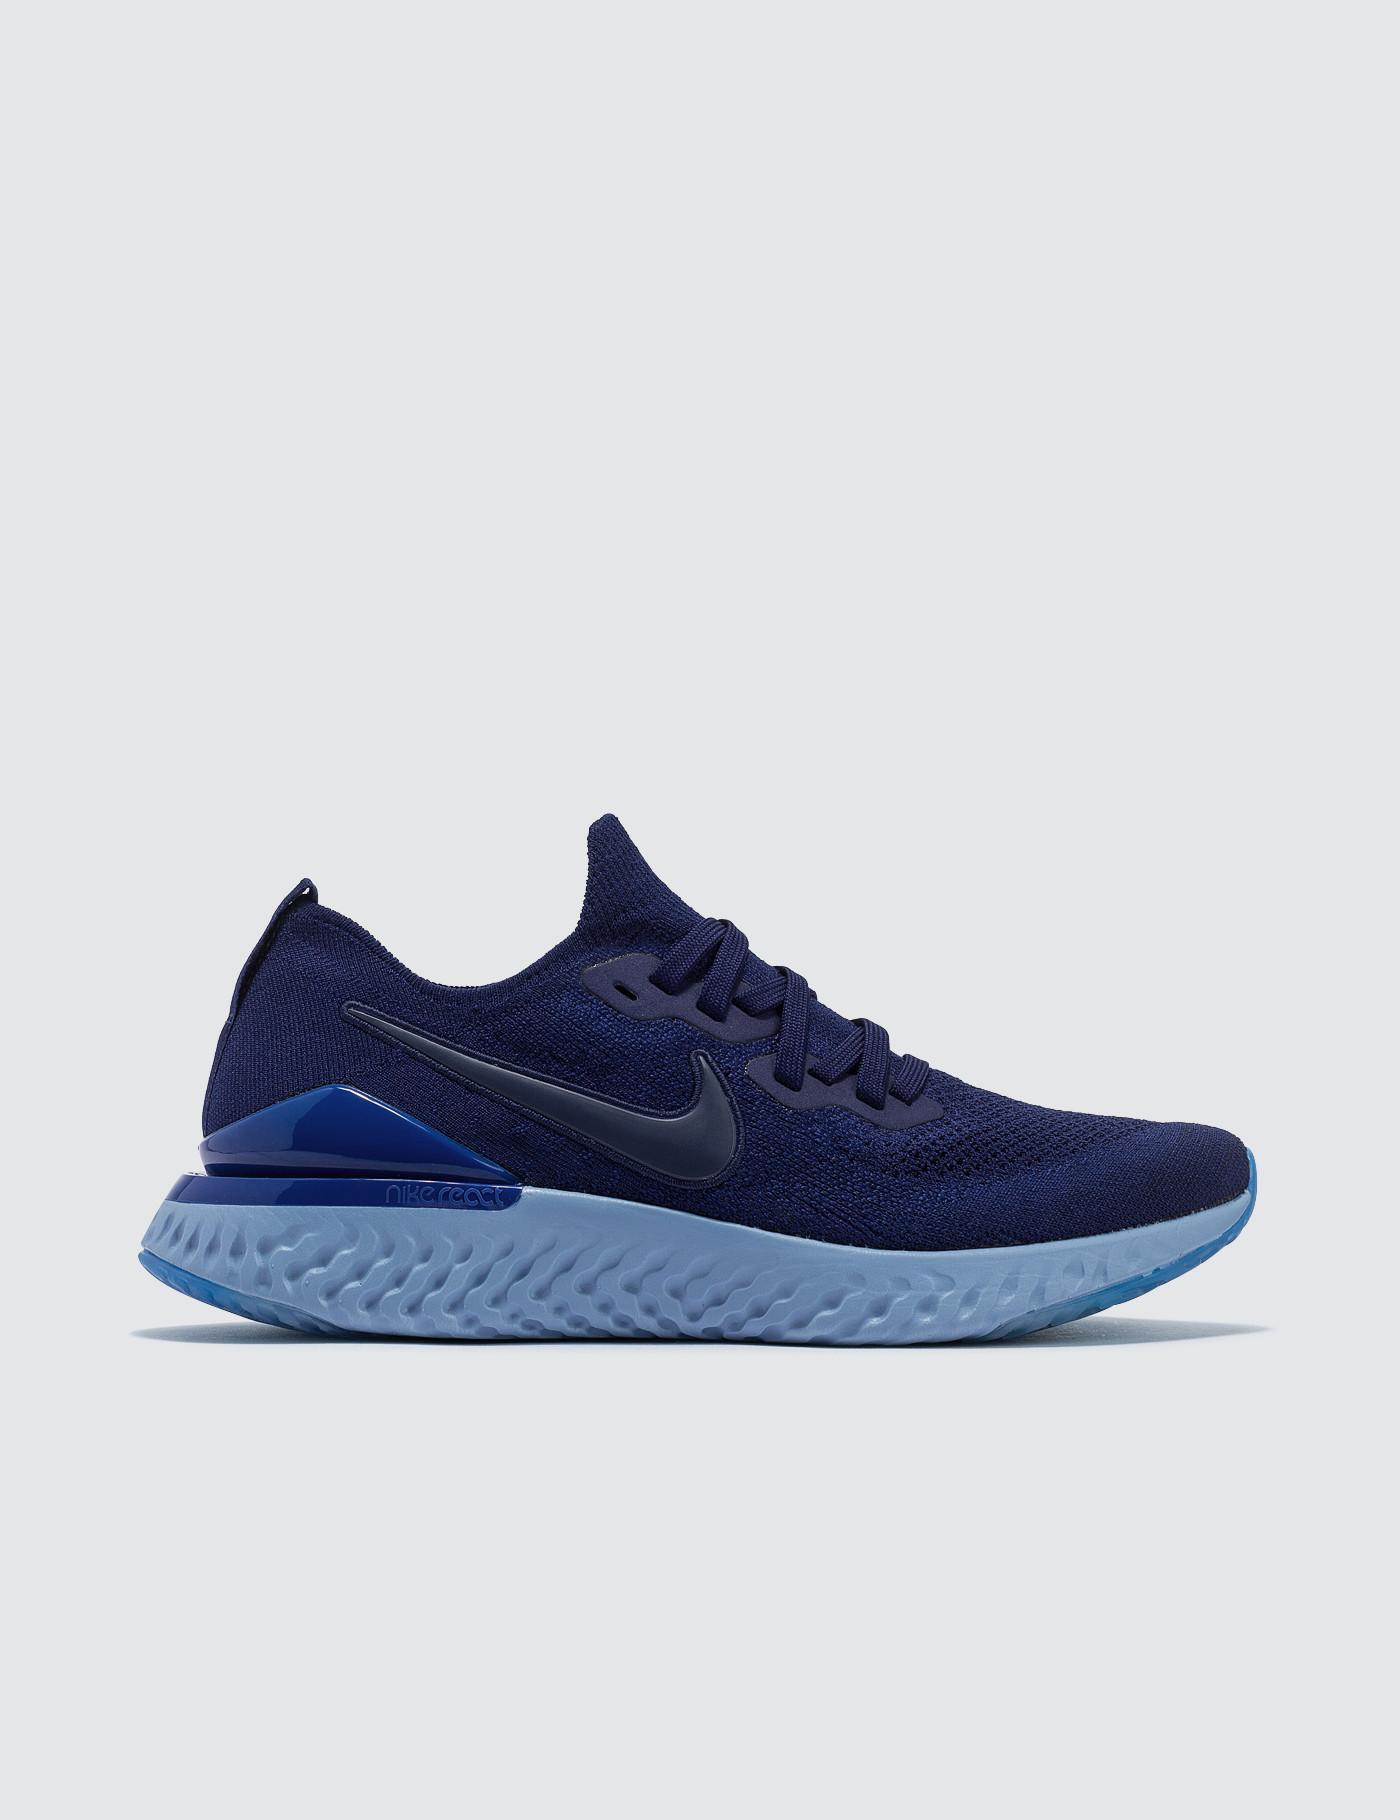 193c6e4d0a43 Nike Epic React Flyknit 2 in Blue for Men - Lyst